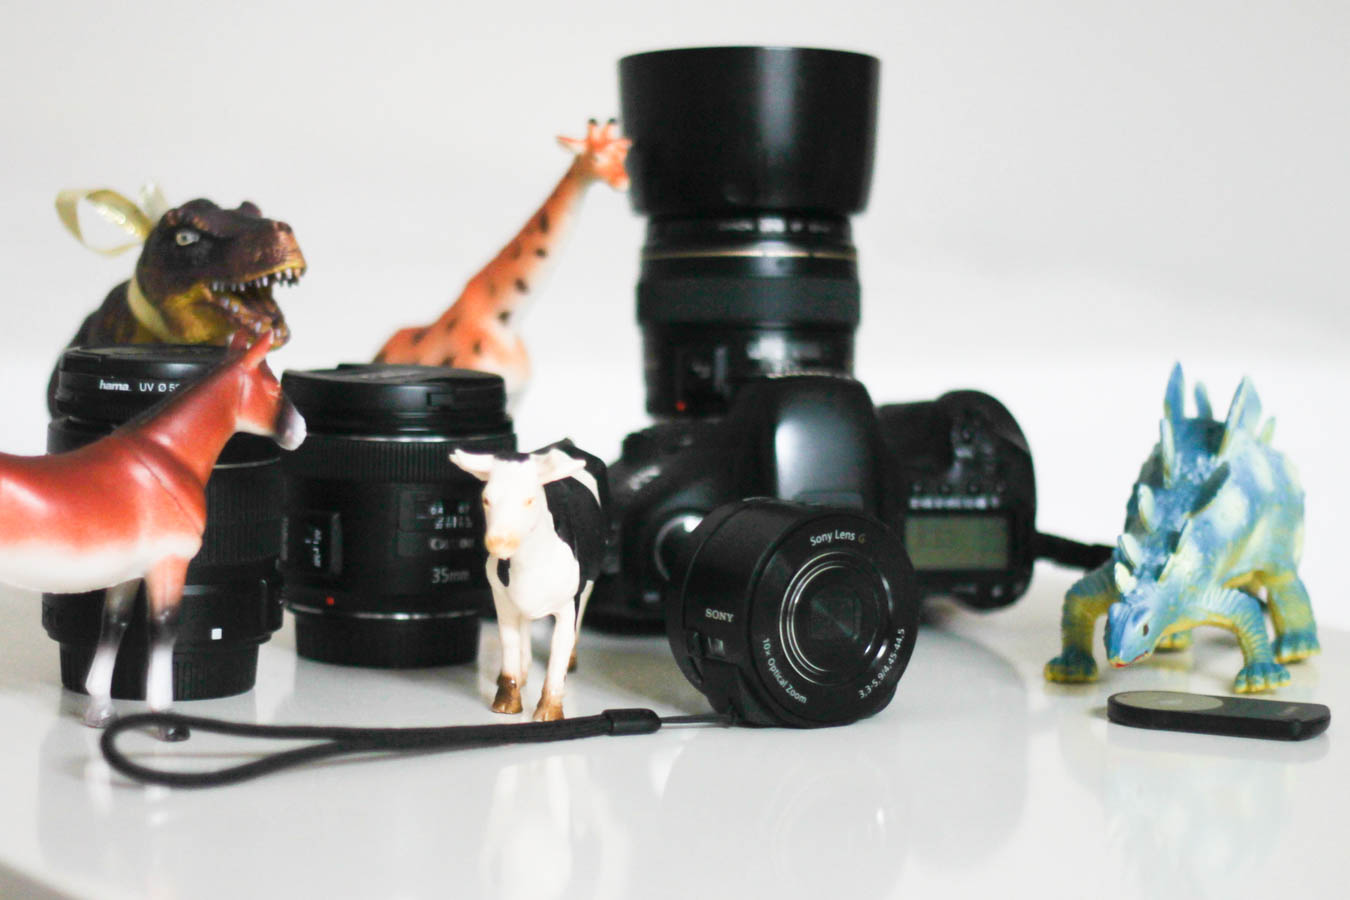 nemesis abbe camera lenses 35mm 50mm 85mm canon eos 7d-1